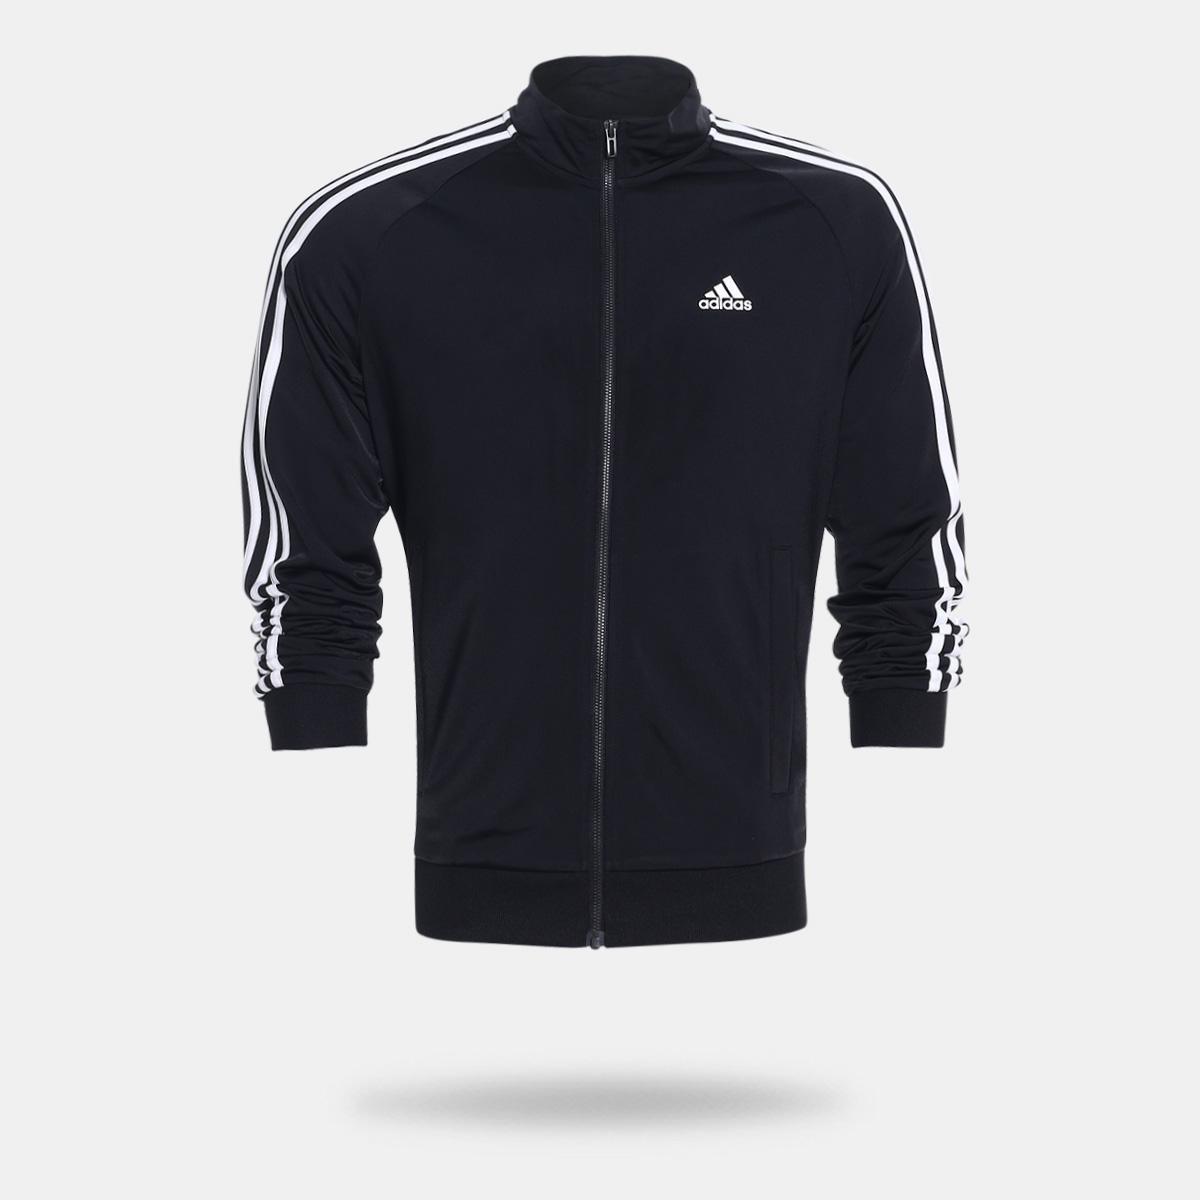 Jaqueta Adidas Ess 3S Ttop Tri Masculina - Compre Agora  816301fae78cc